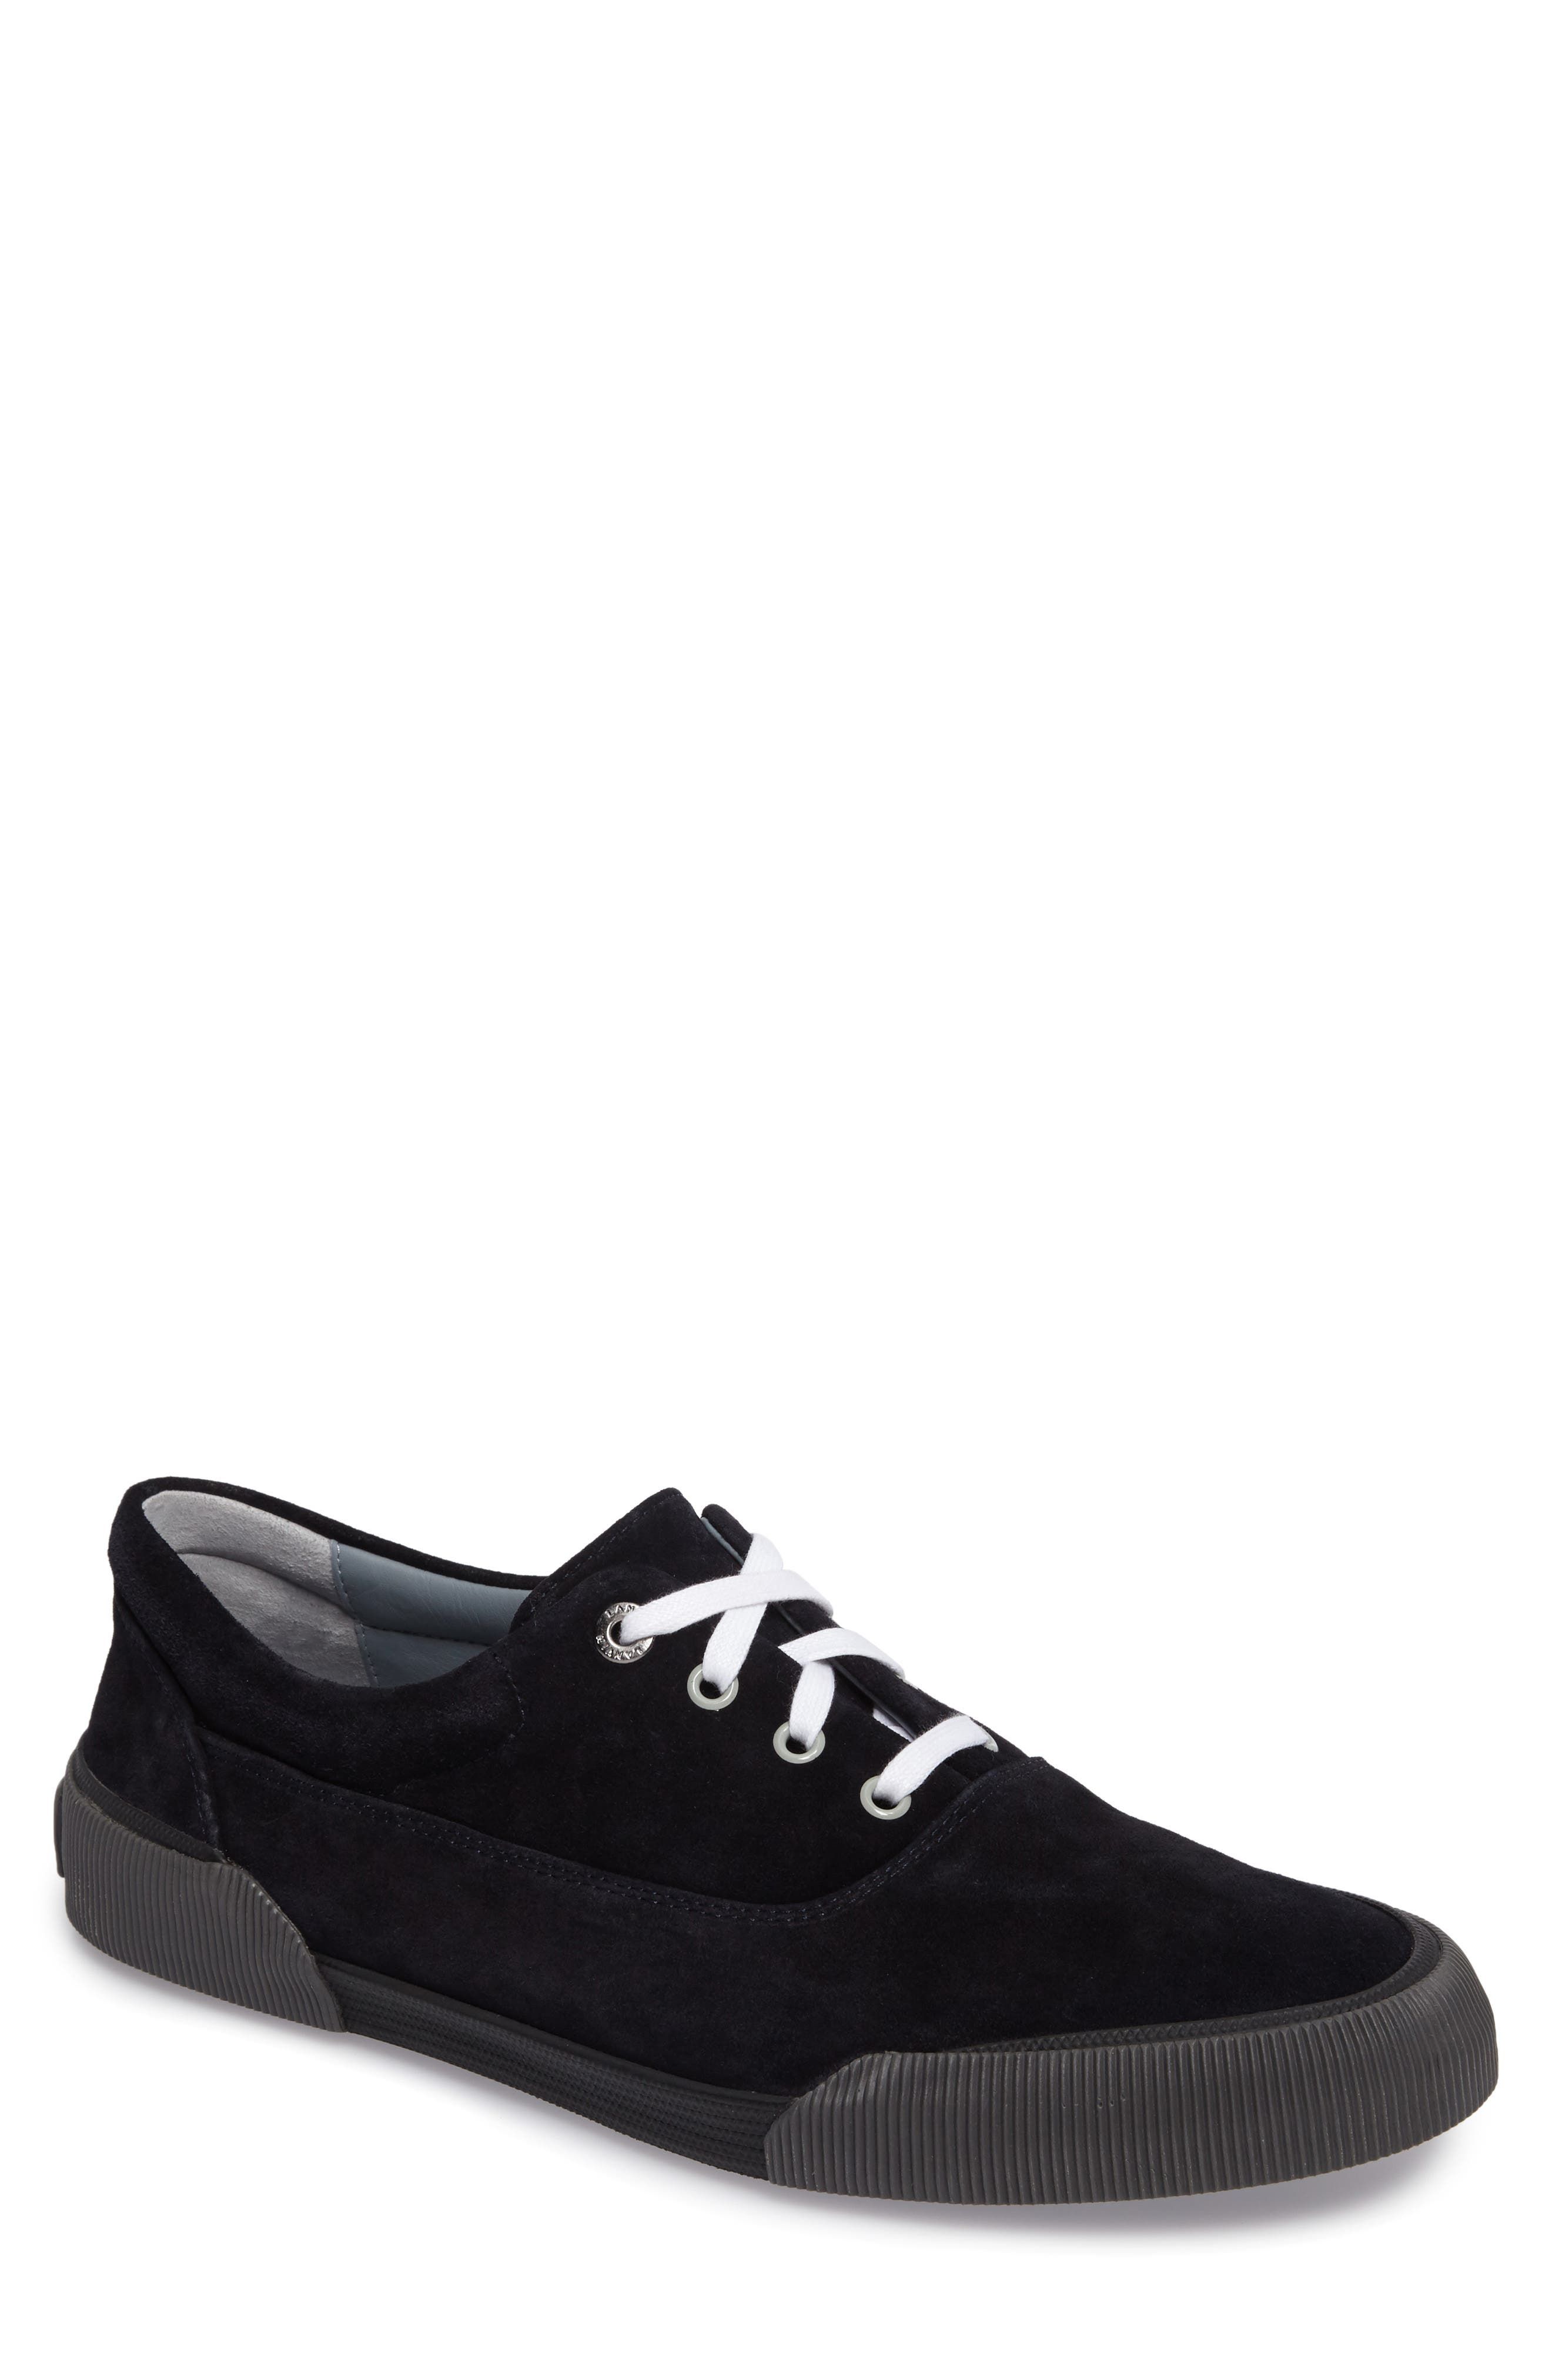 Alternate Image 1 Selected - Lanvin Suede Sneaker (Men)